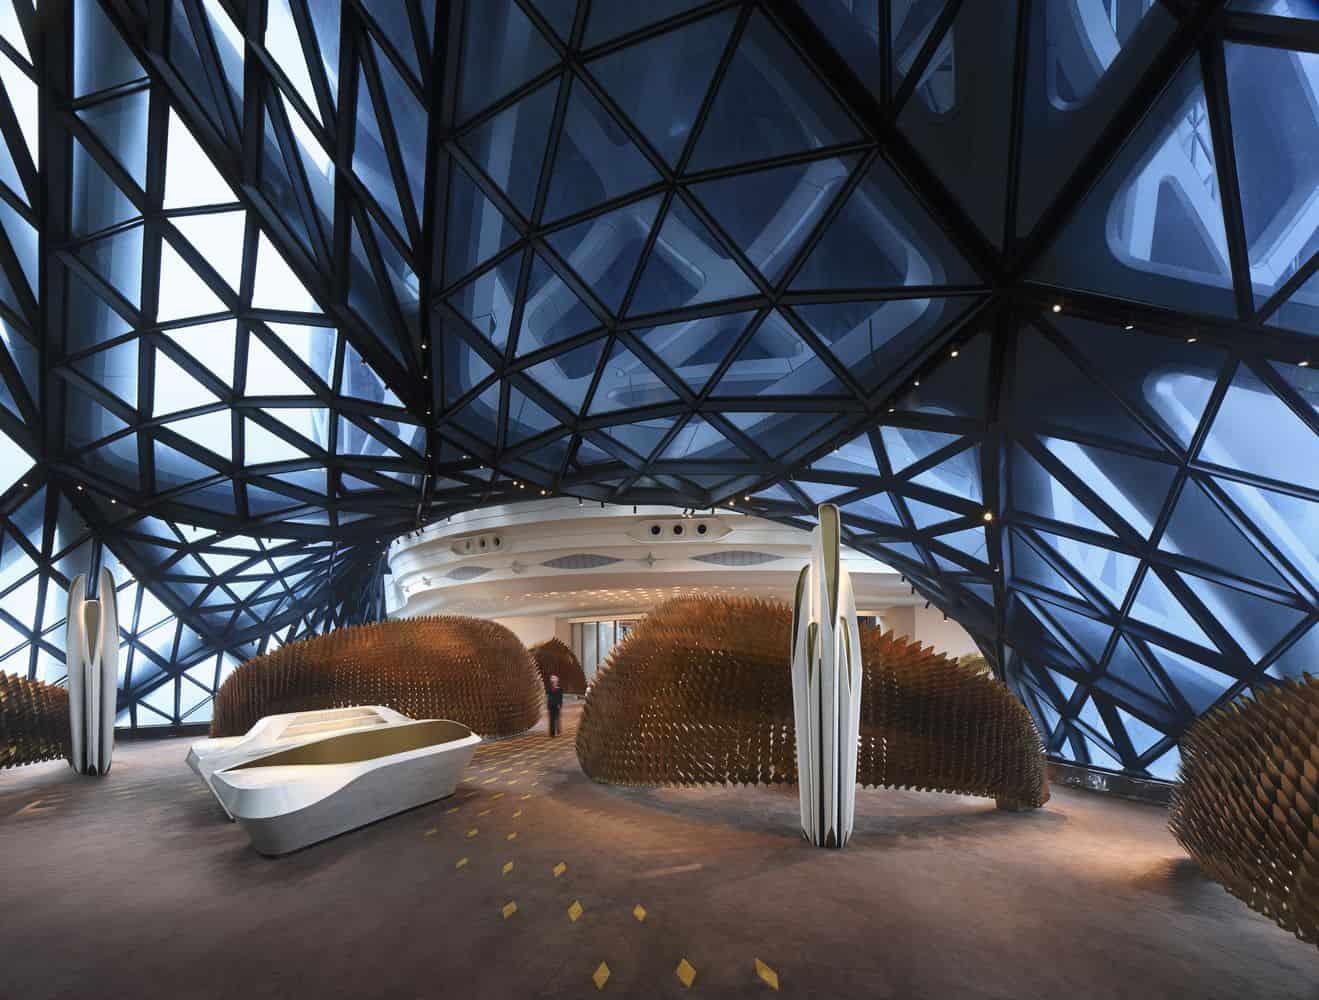 morpheus hotel zaha hadid architects 10